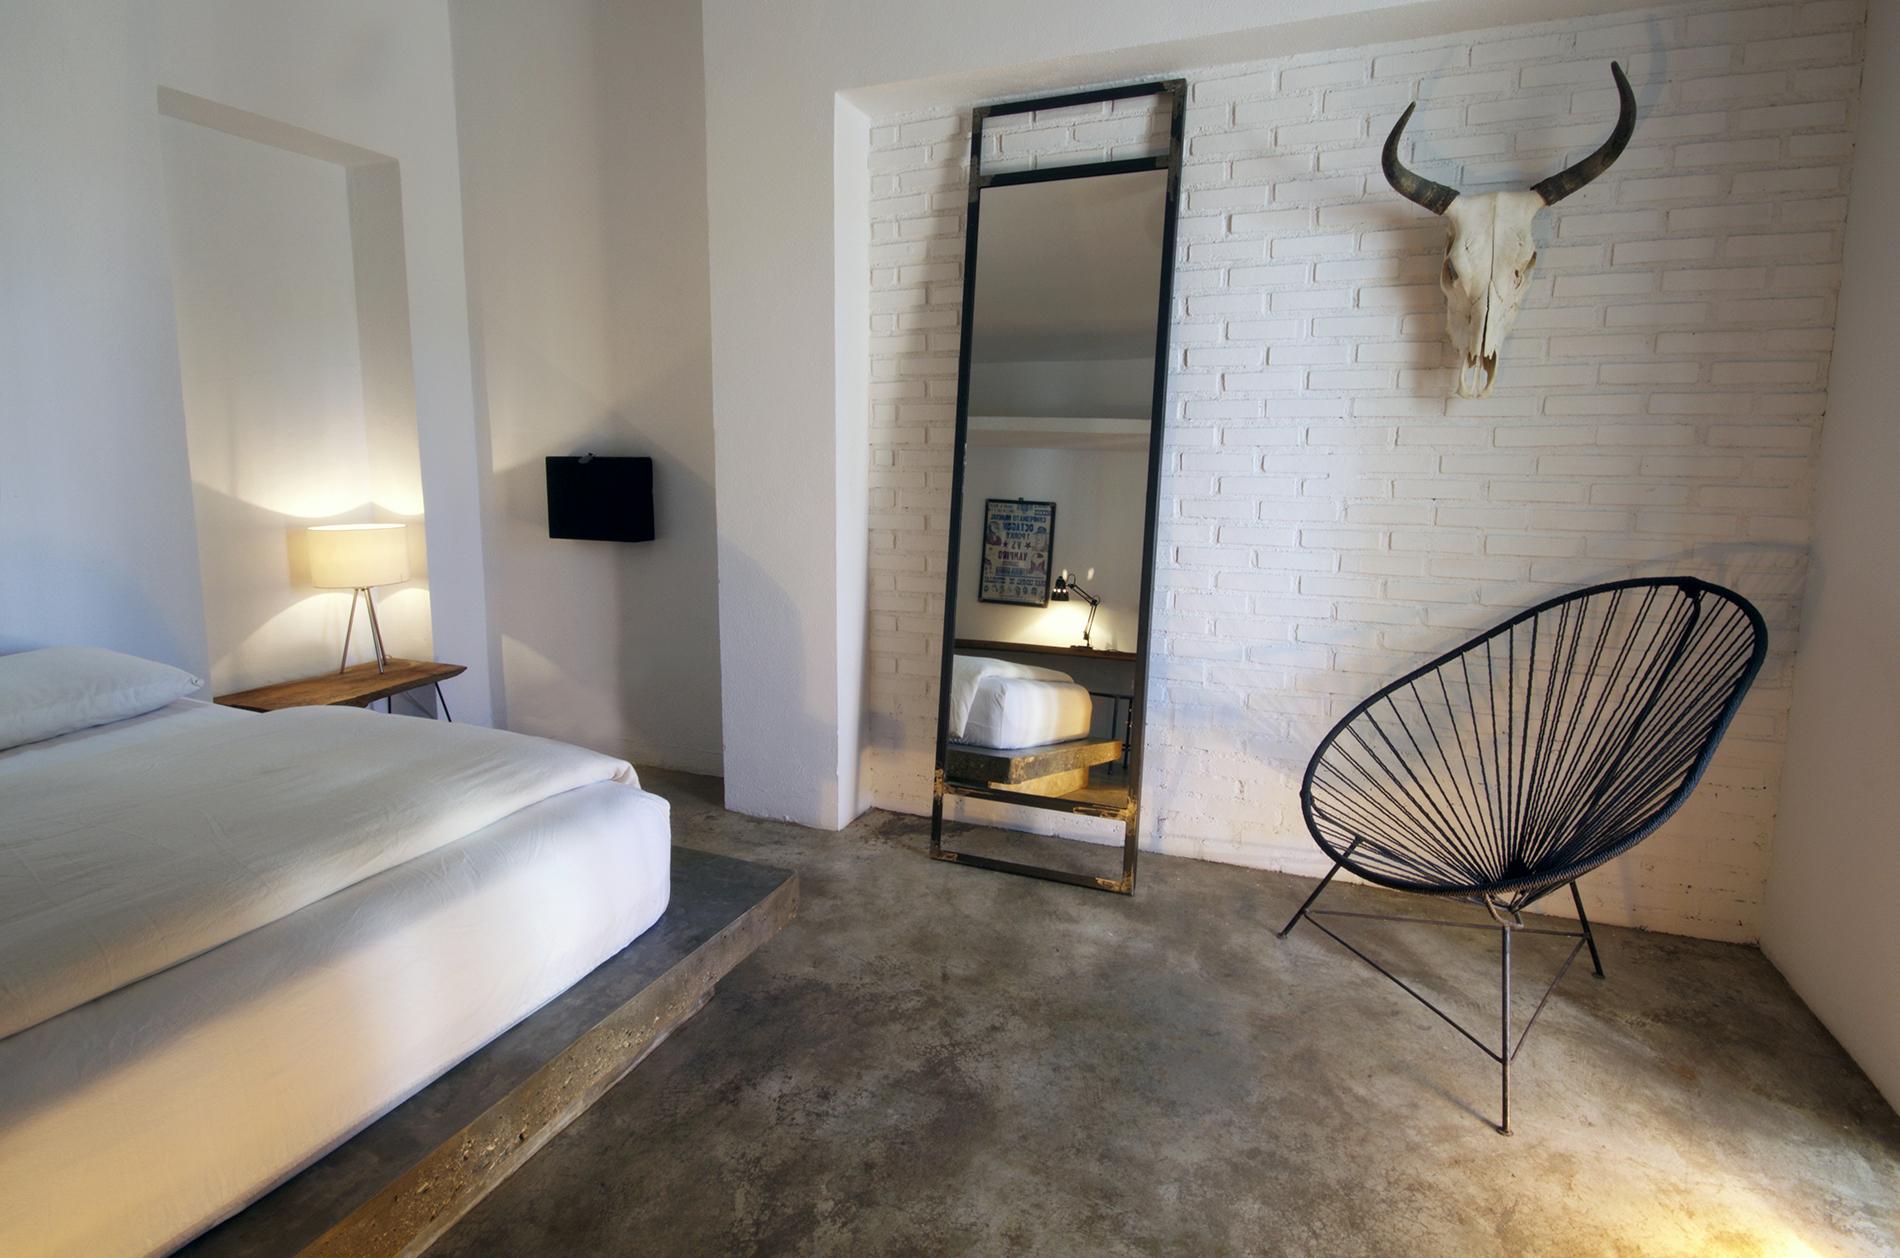 Guest room at Drift San Jose  (photo courtesy of Drift San Jose)